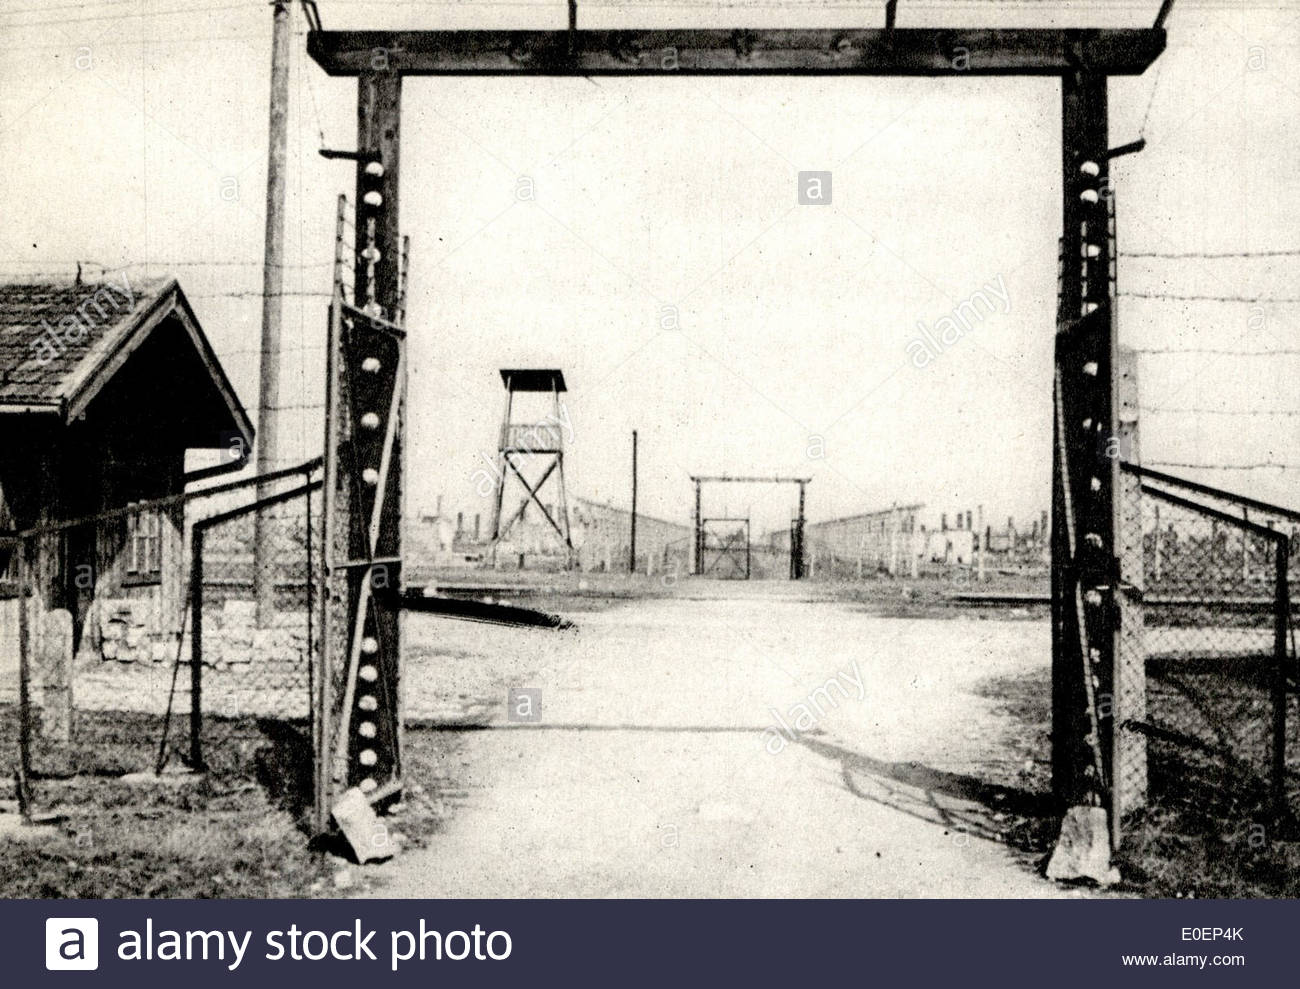 Auschwitz concentration camp (German: Konzentrationslager Auschwitz) - old photograph - Stock Image